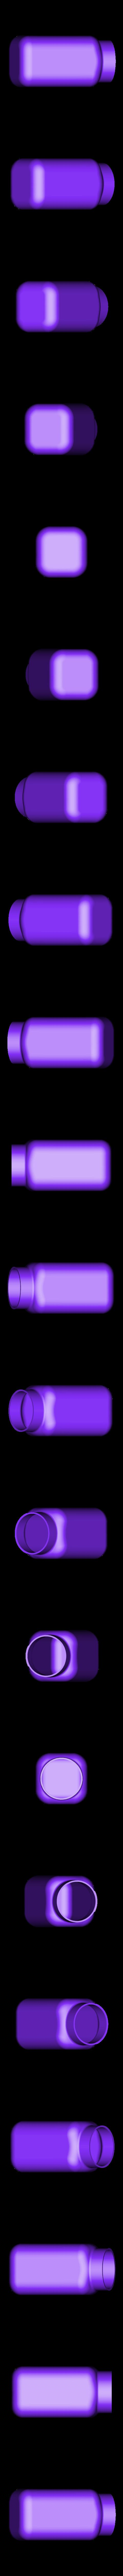 JAR.stl Download free STL file Pipe Lamp • Model to 3D print, mtairymd